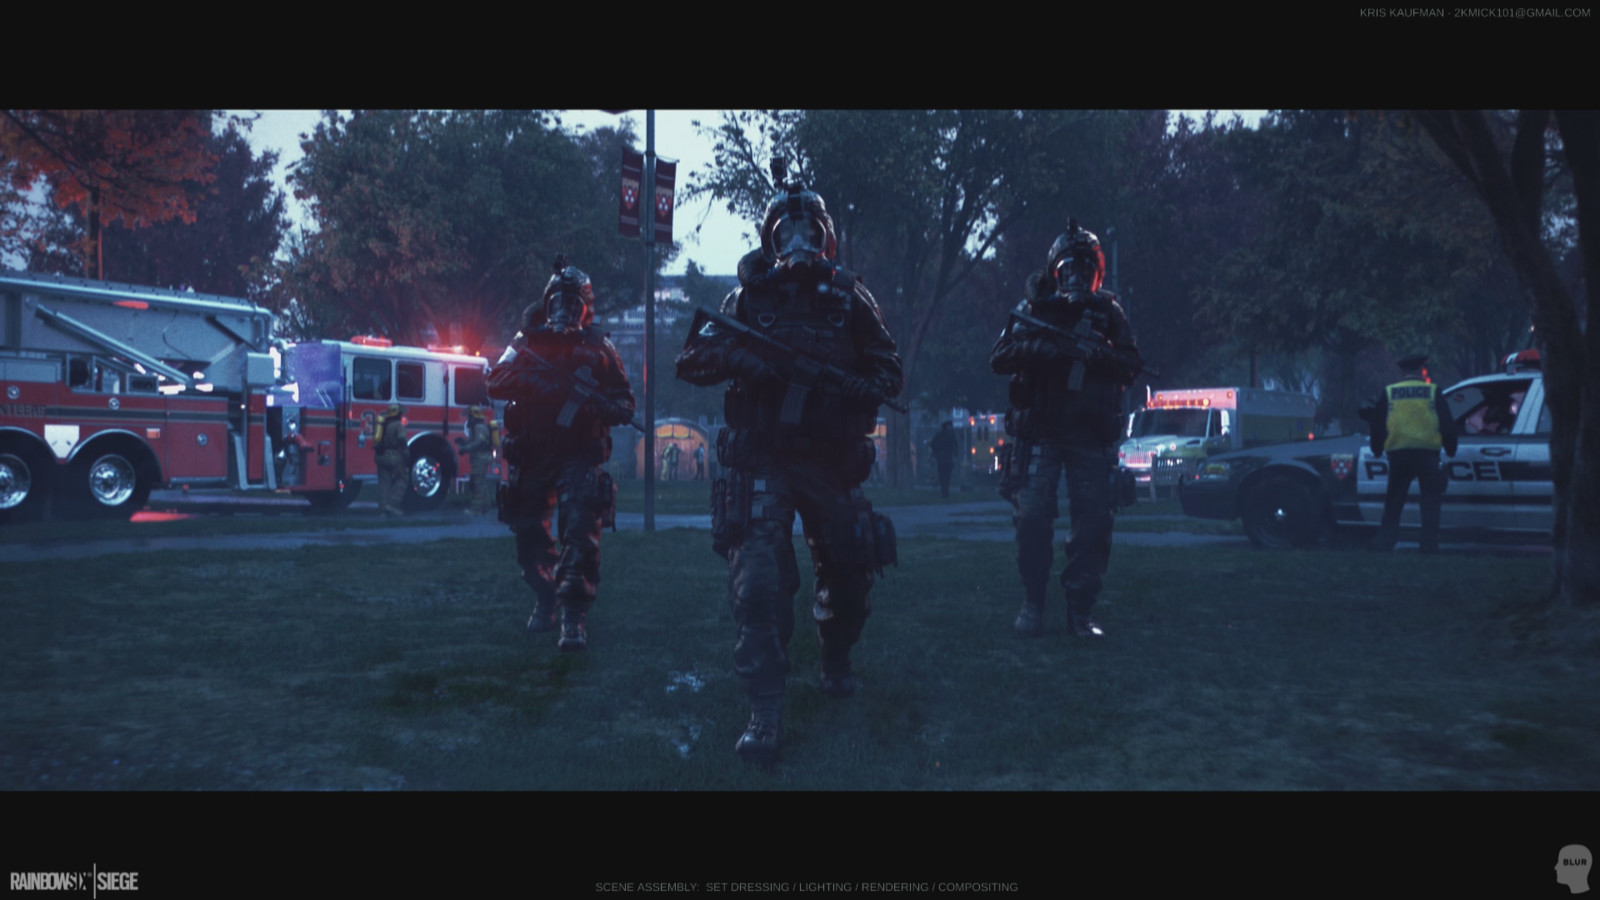 Rainbow 6 Siege: Set Dressing / Lighting / Rendering / Compositing